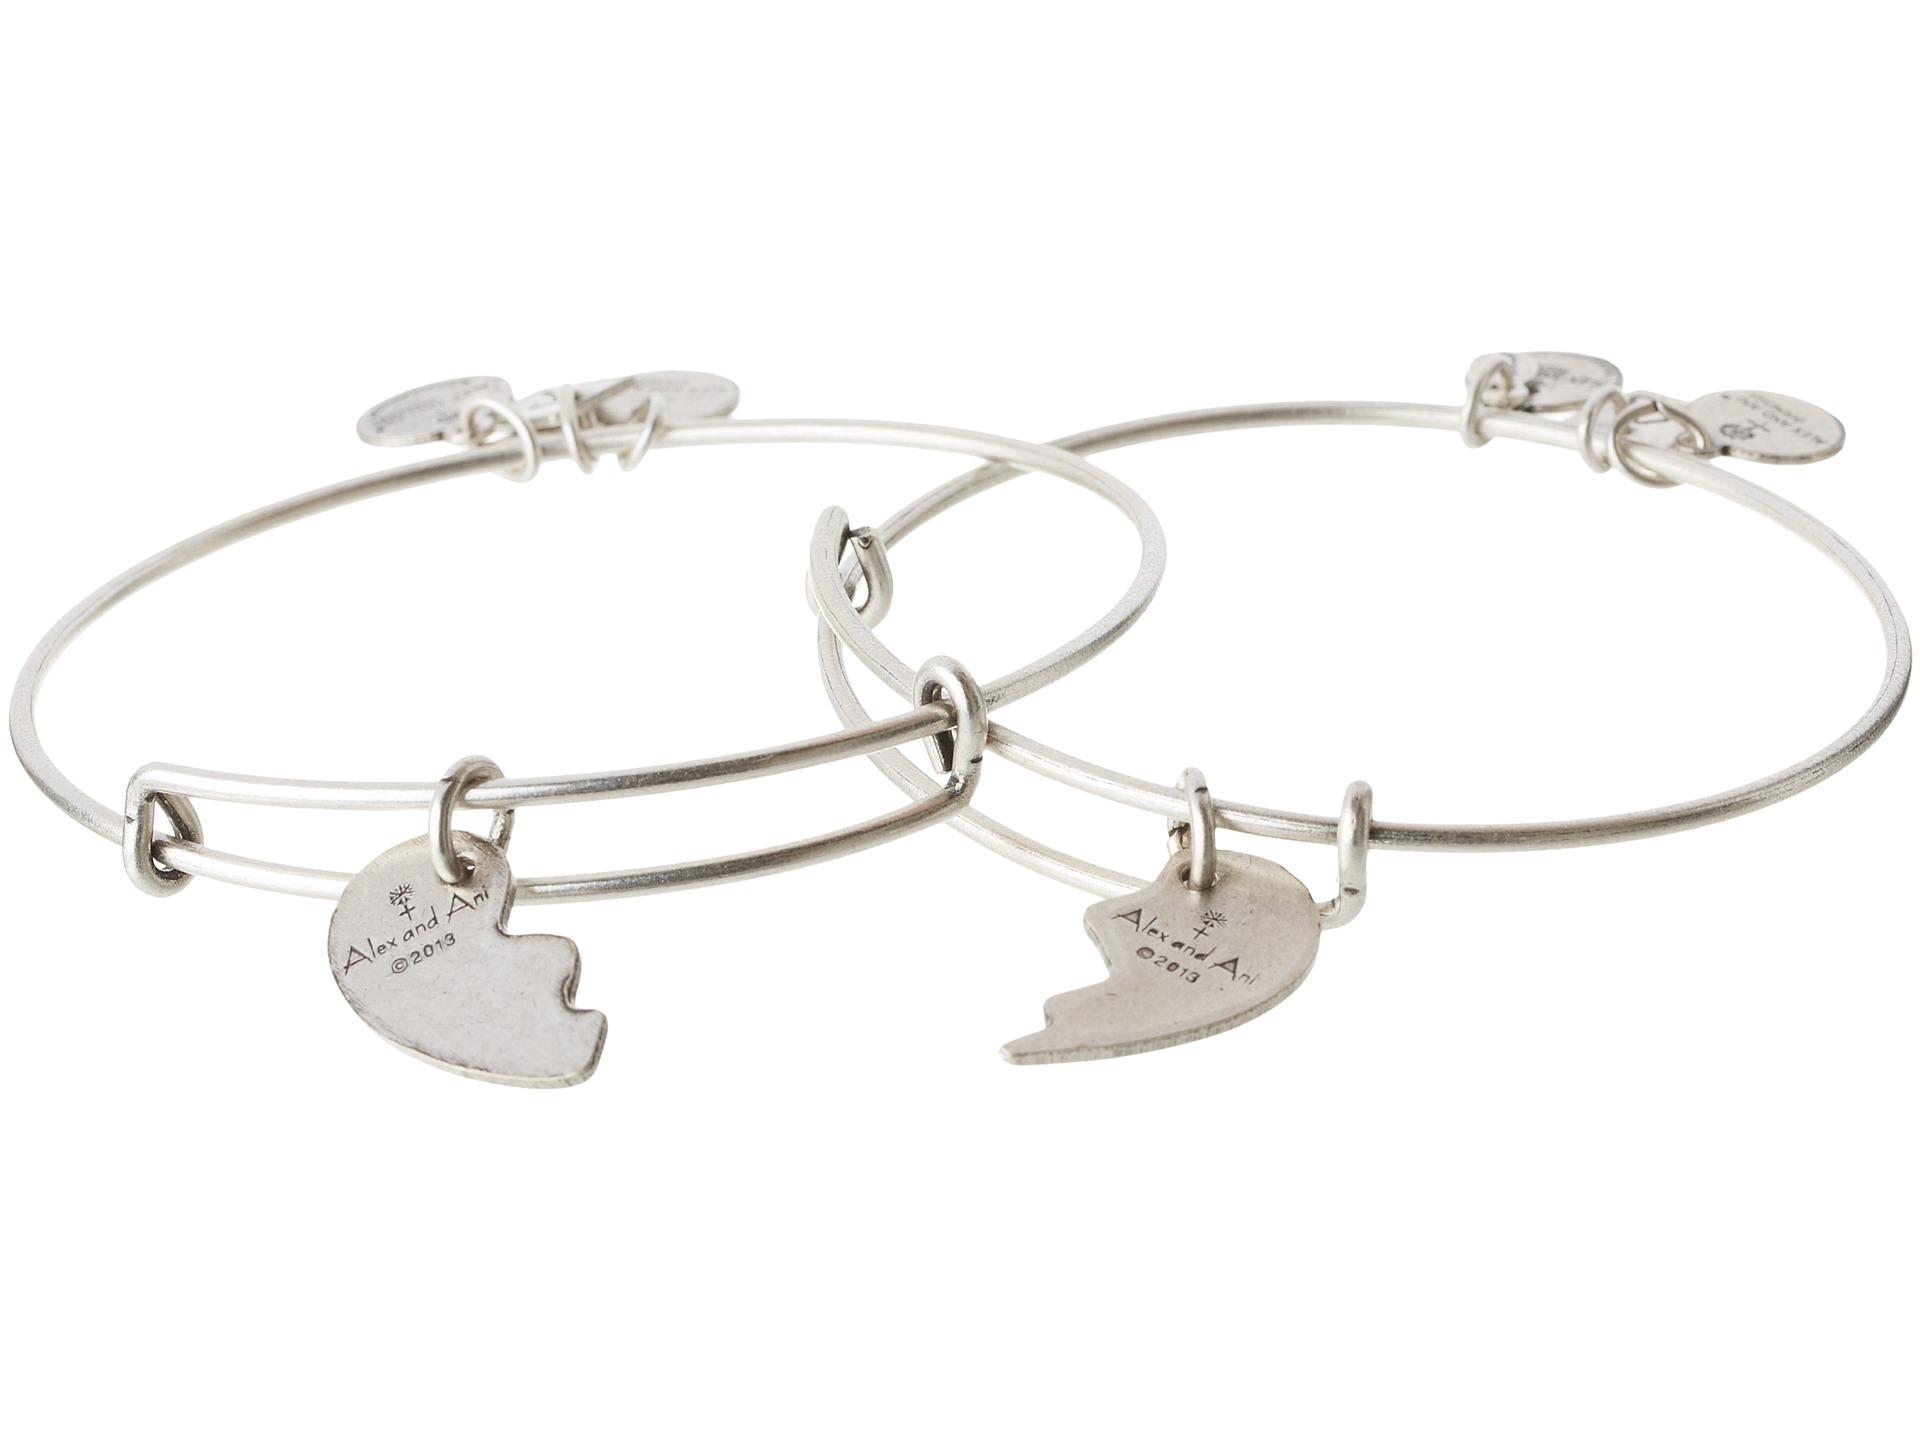 Alex And Ani Friendship Bracelets Uk The Best Ancgweb Org Of 2018